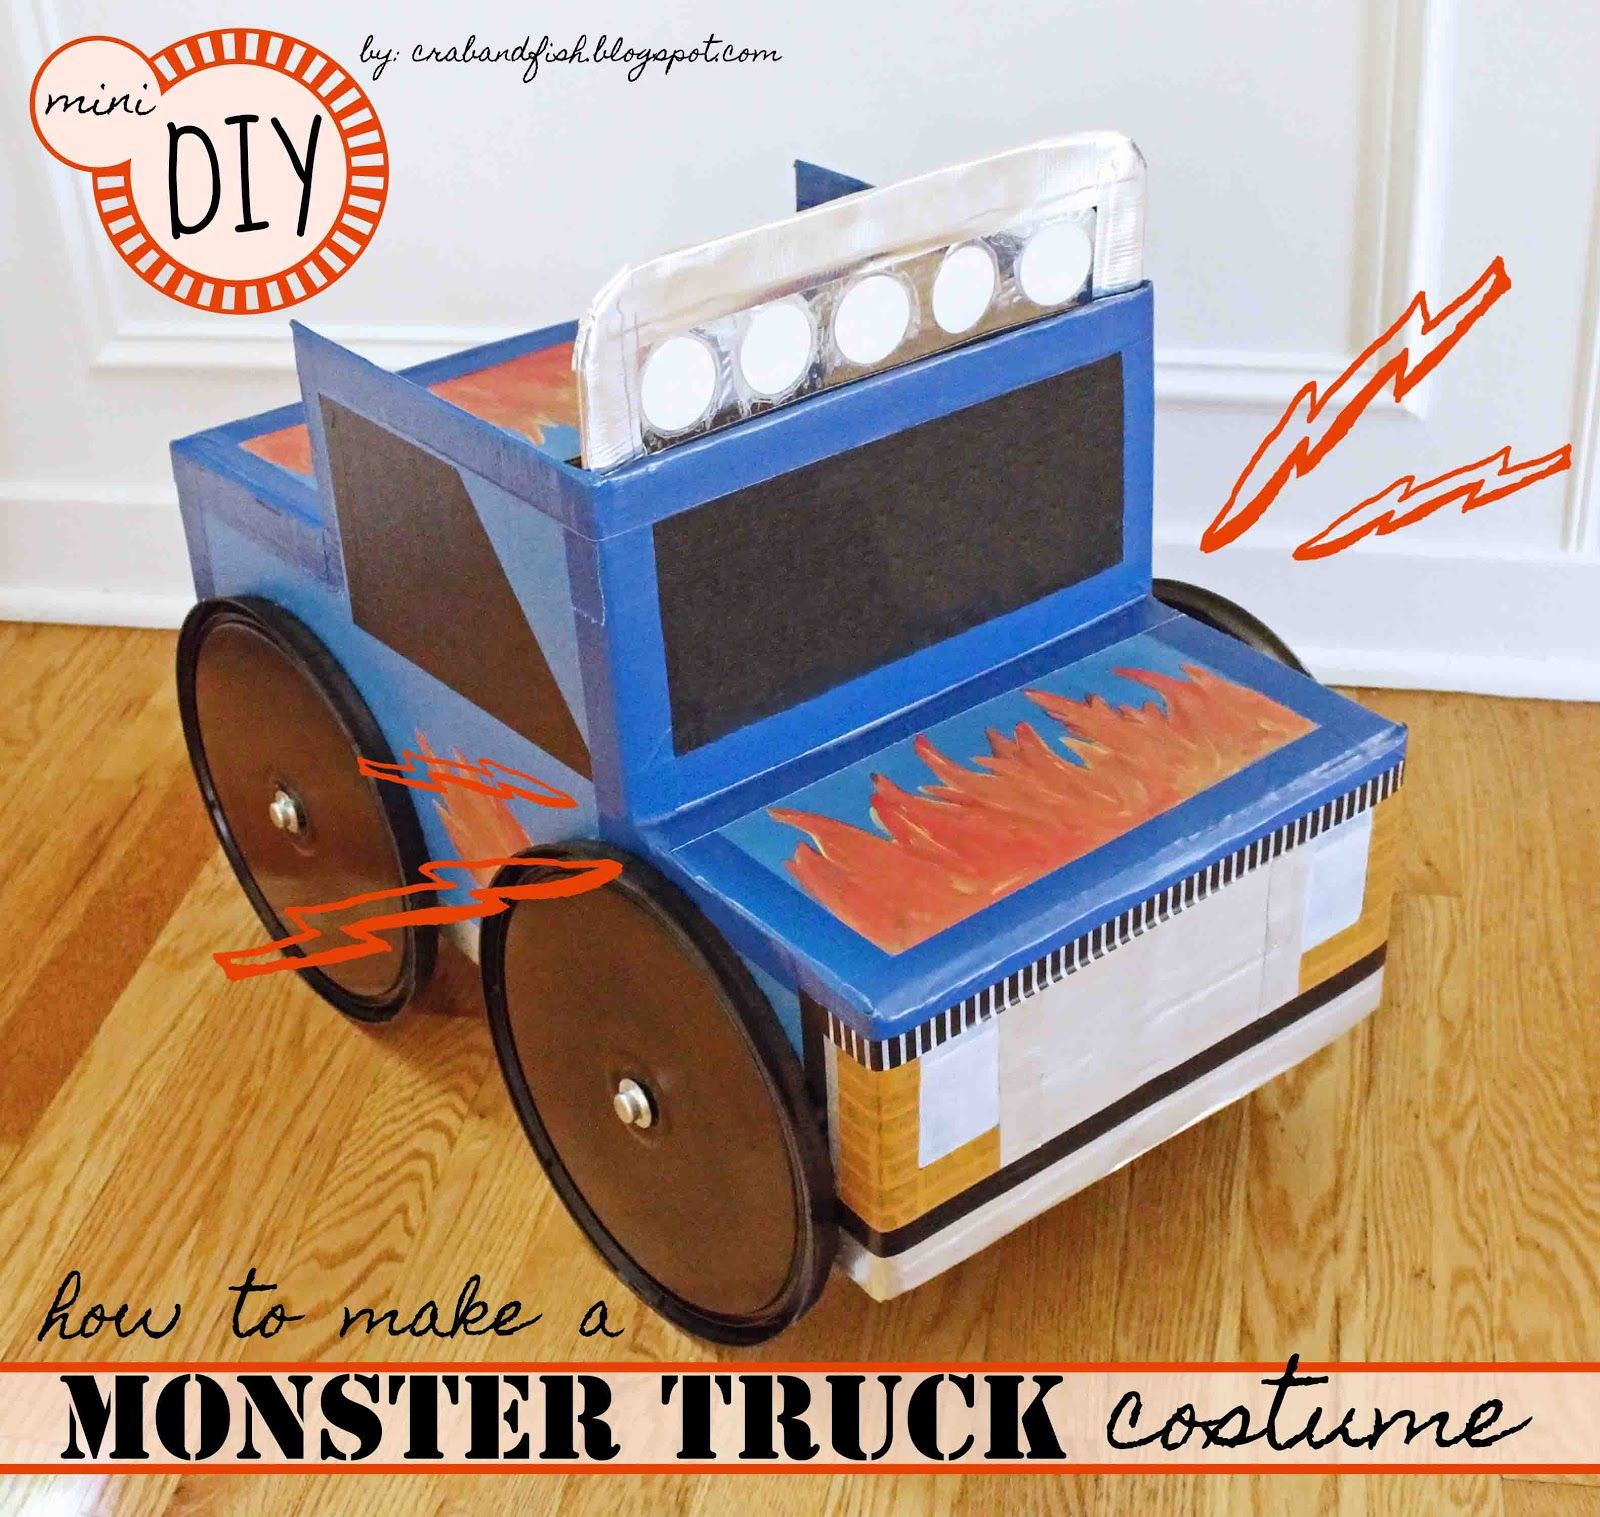 miniDIY: monster truck halloween costume from cardboard box